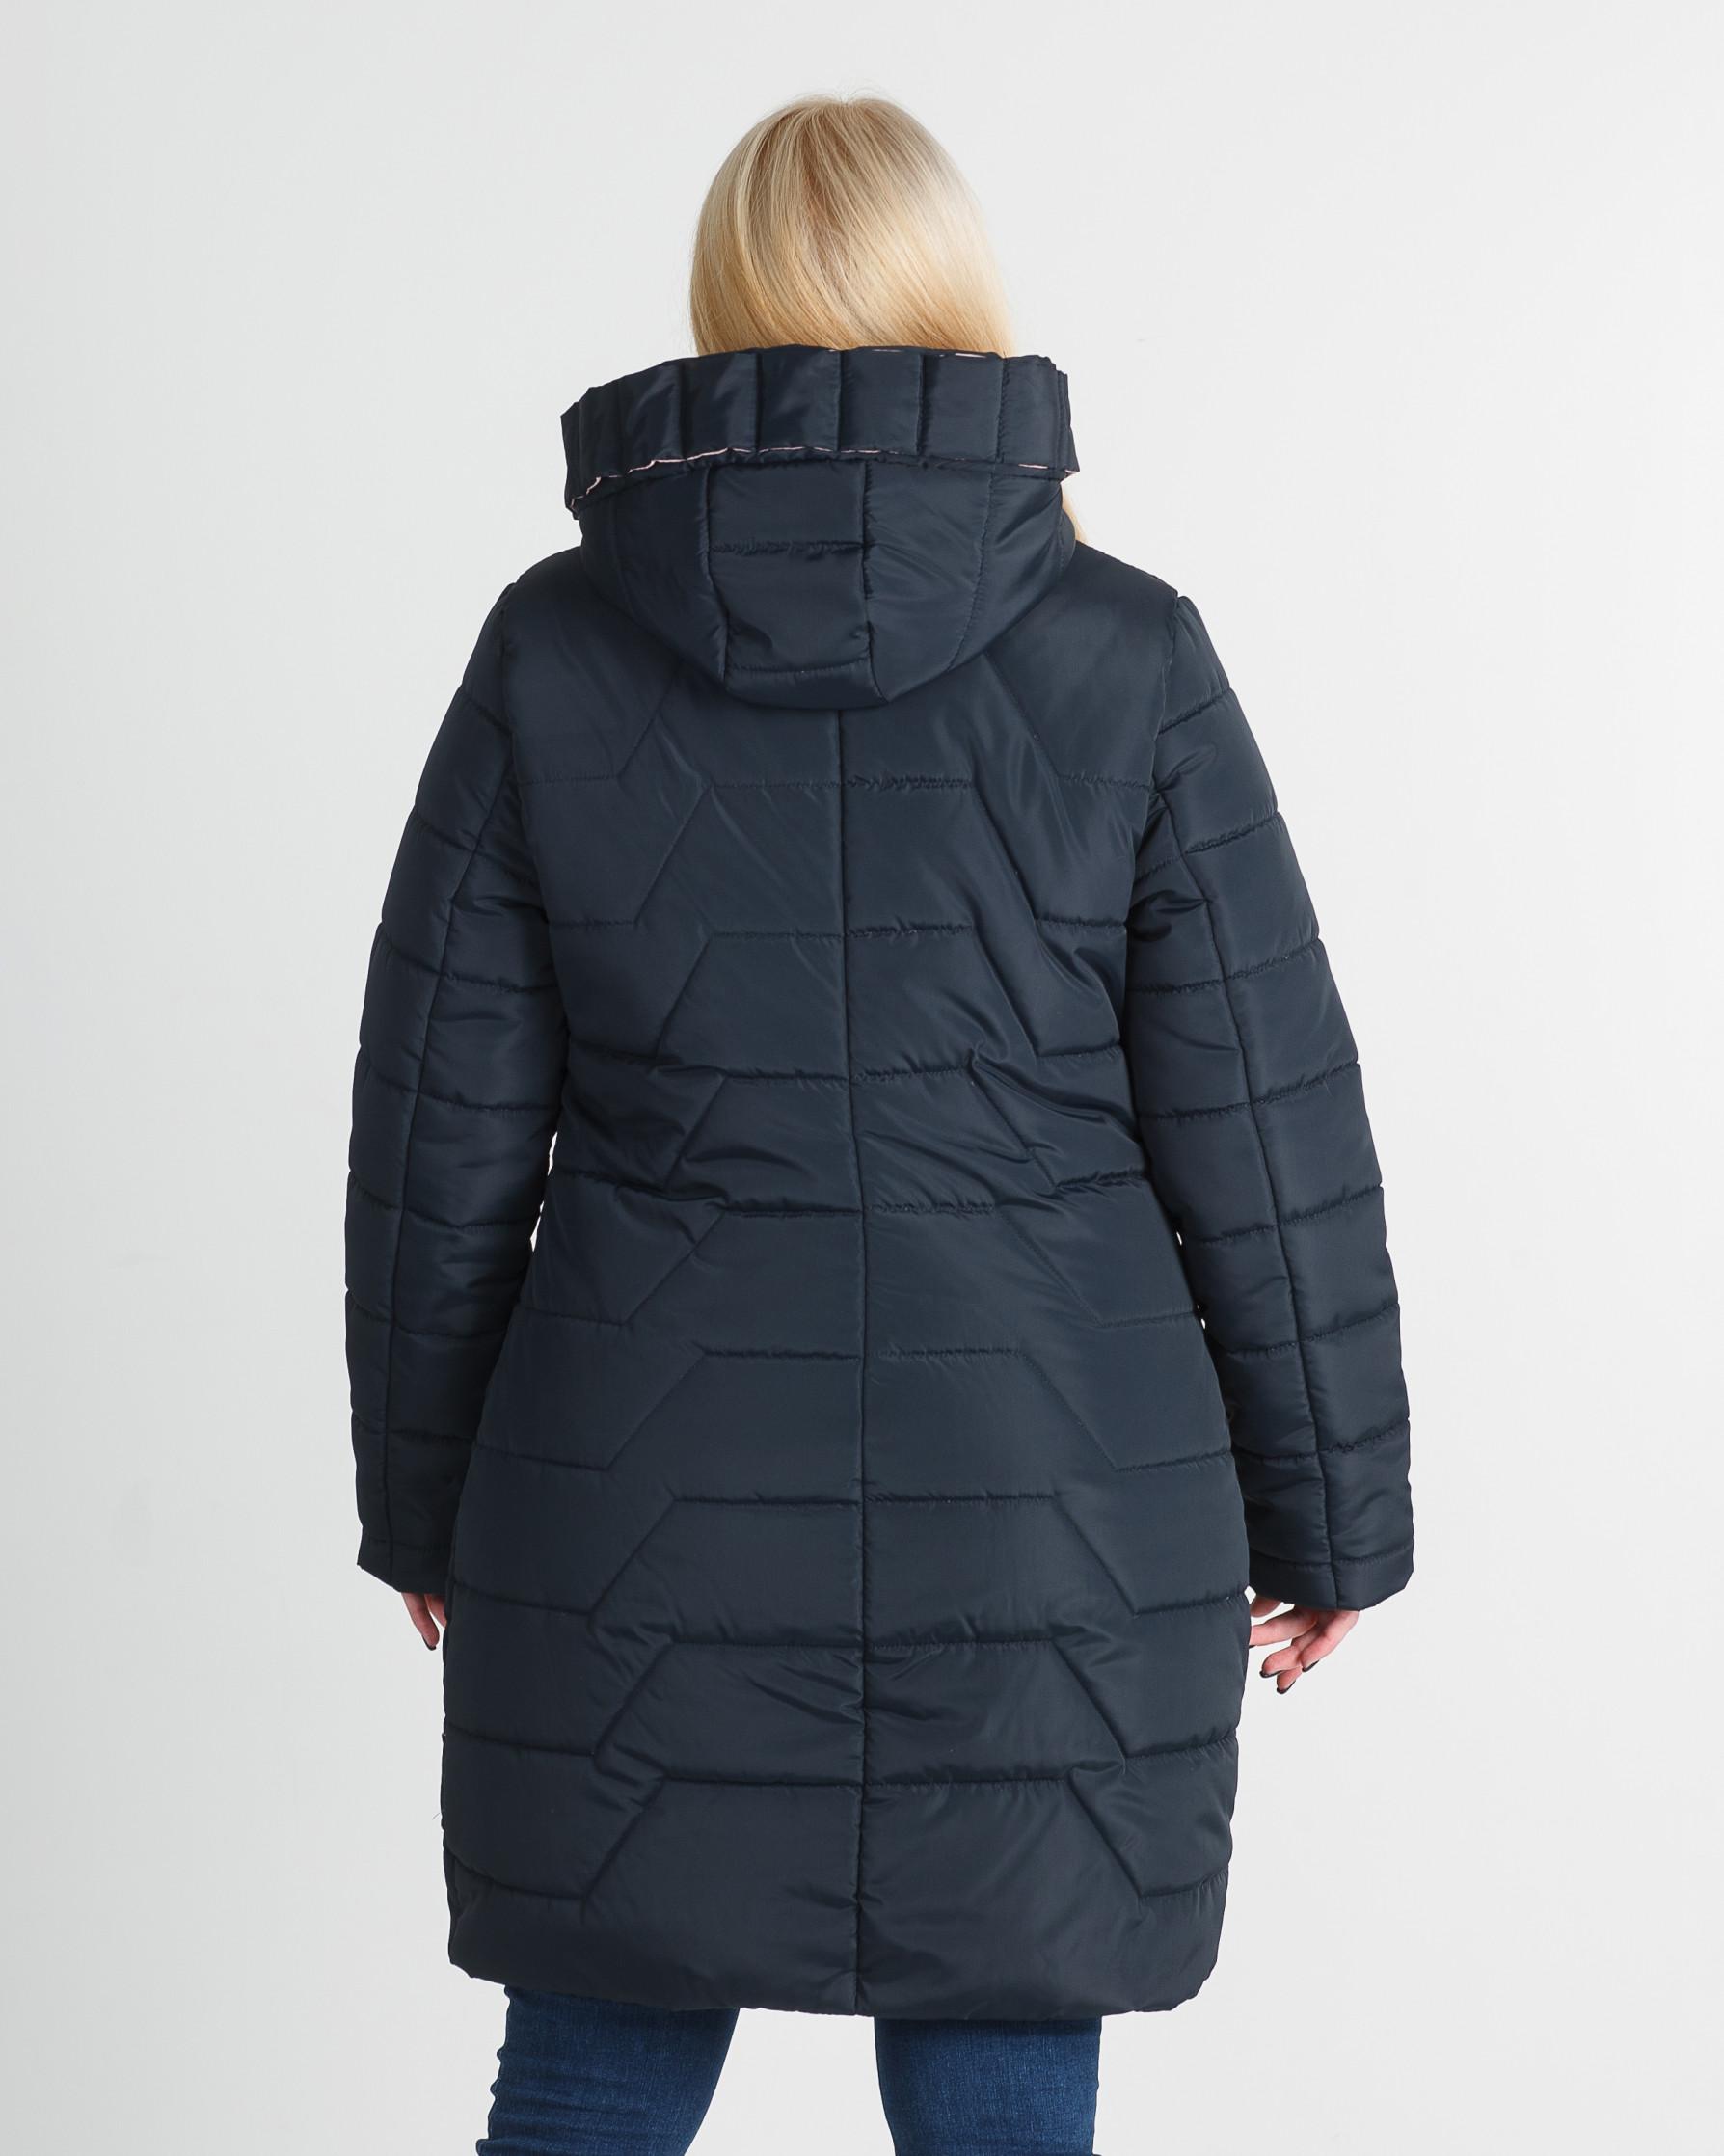 Куртка зимняя без меха тёмно синяя Кайли